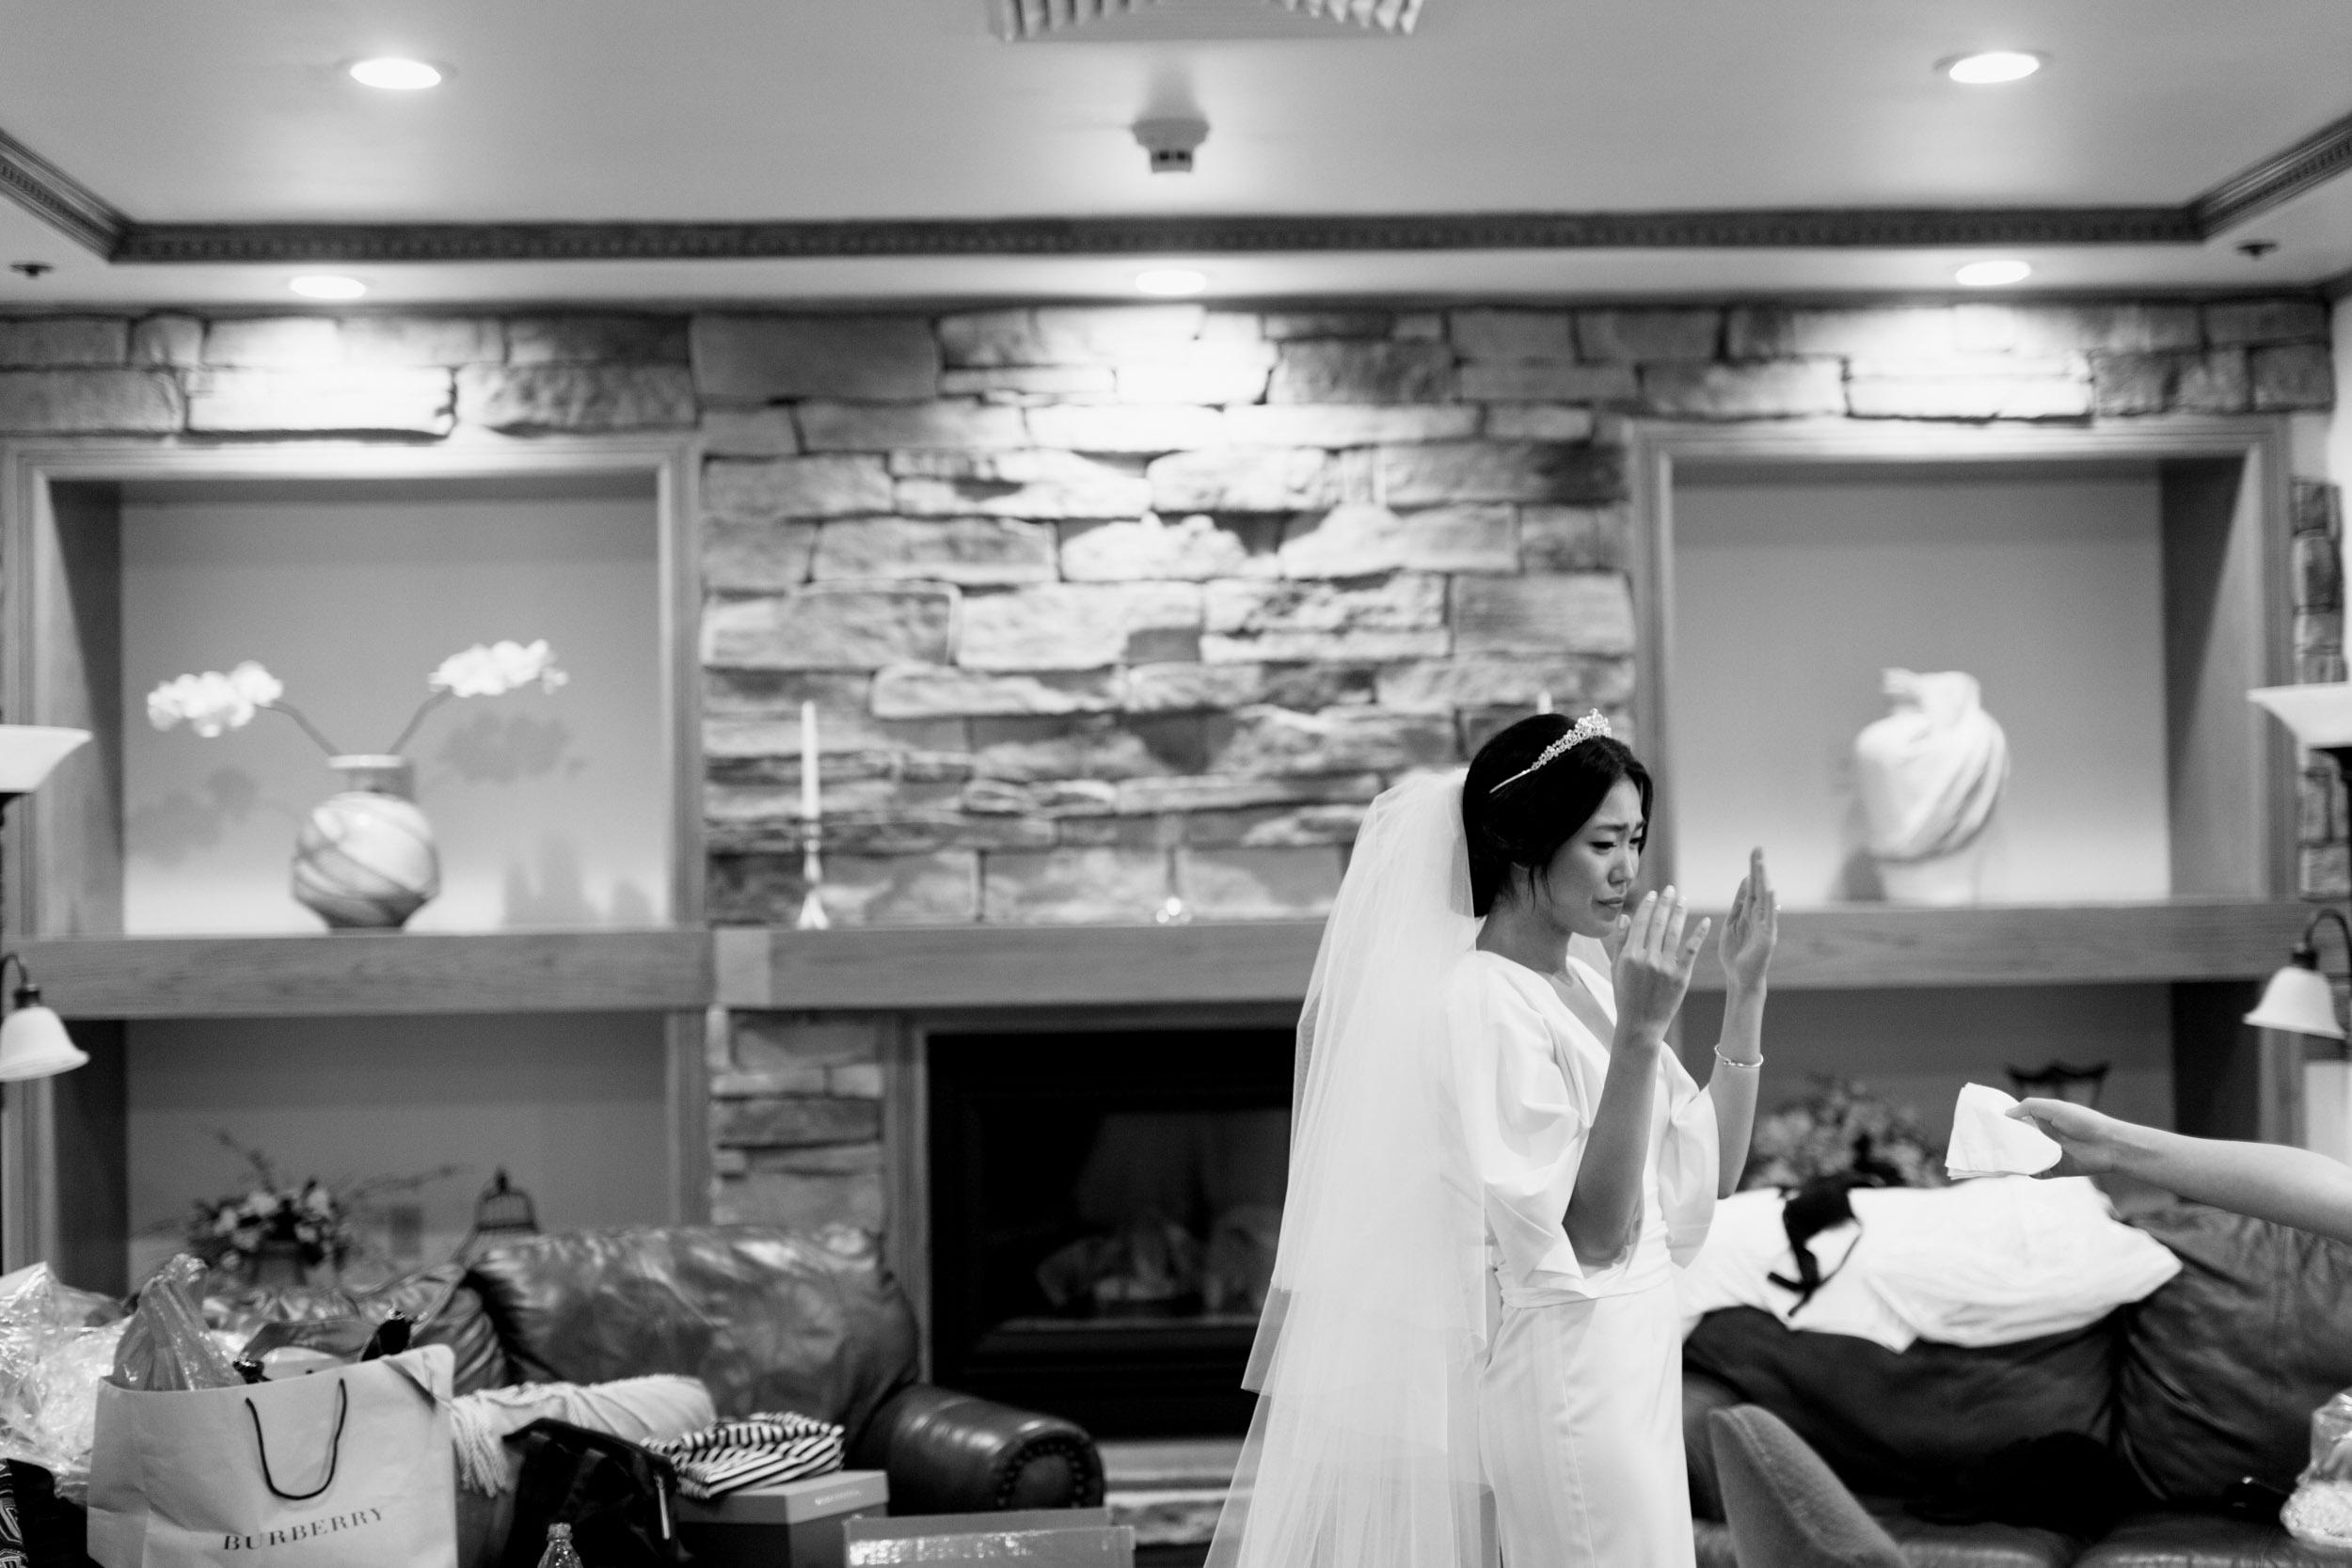 jean-arnold-wedding-0019.jpg